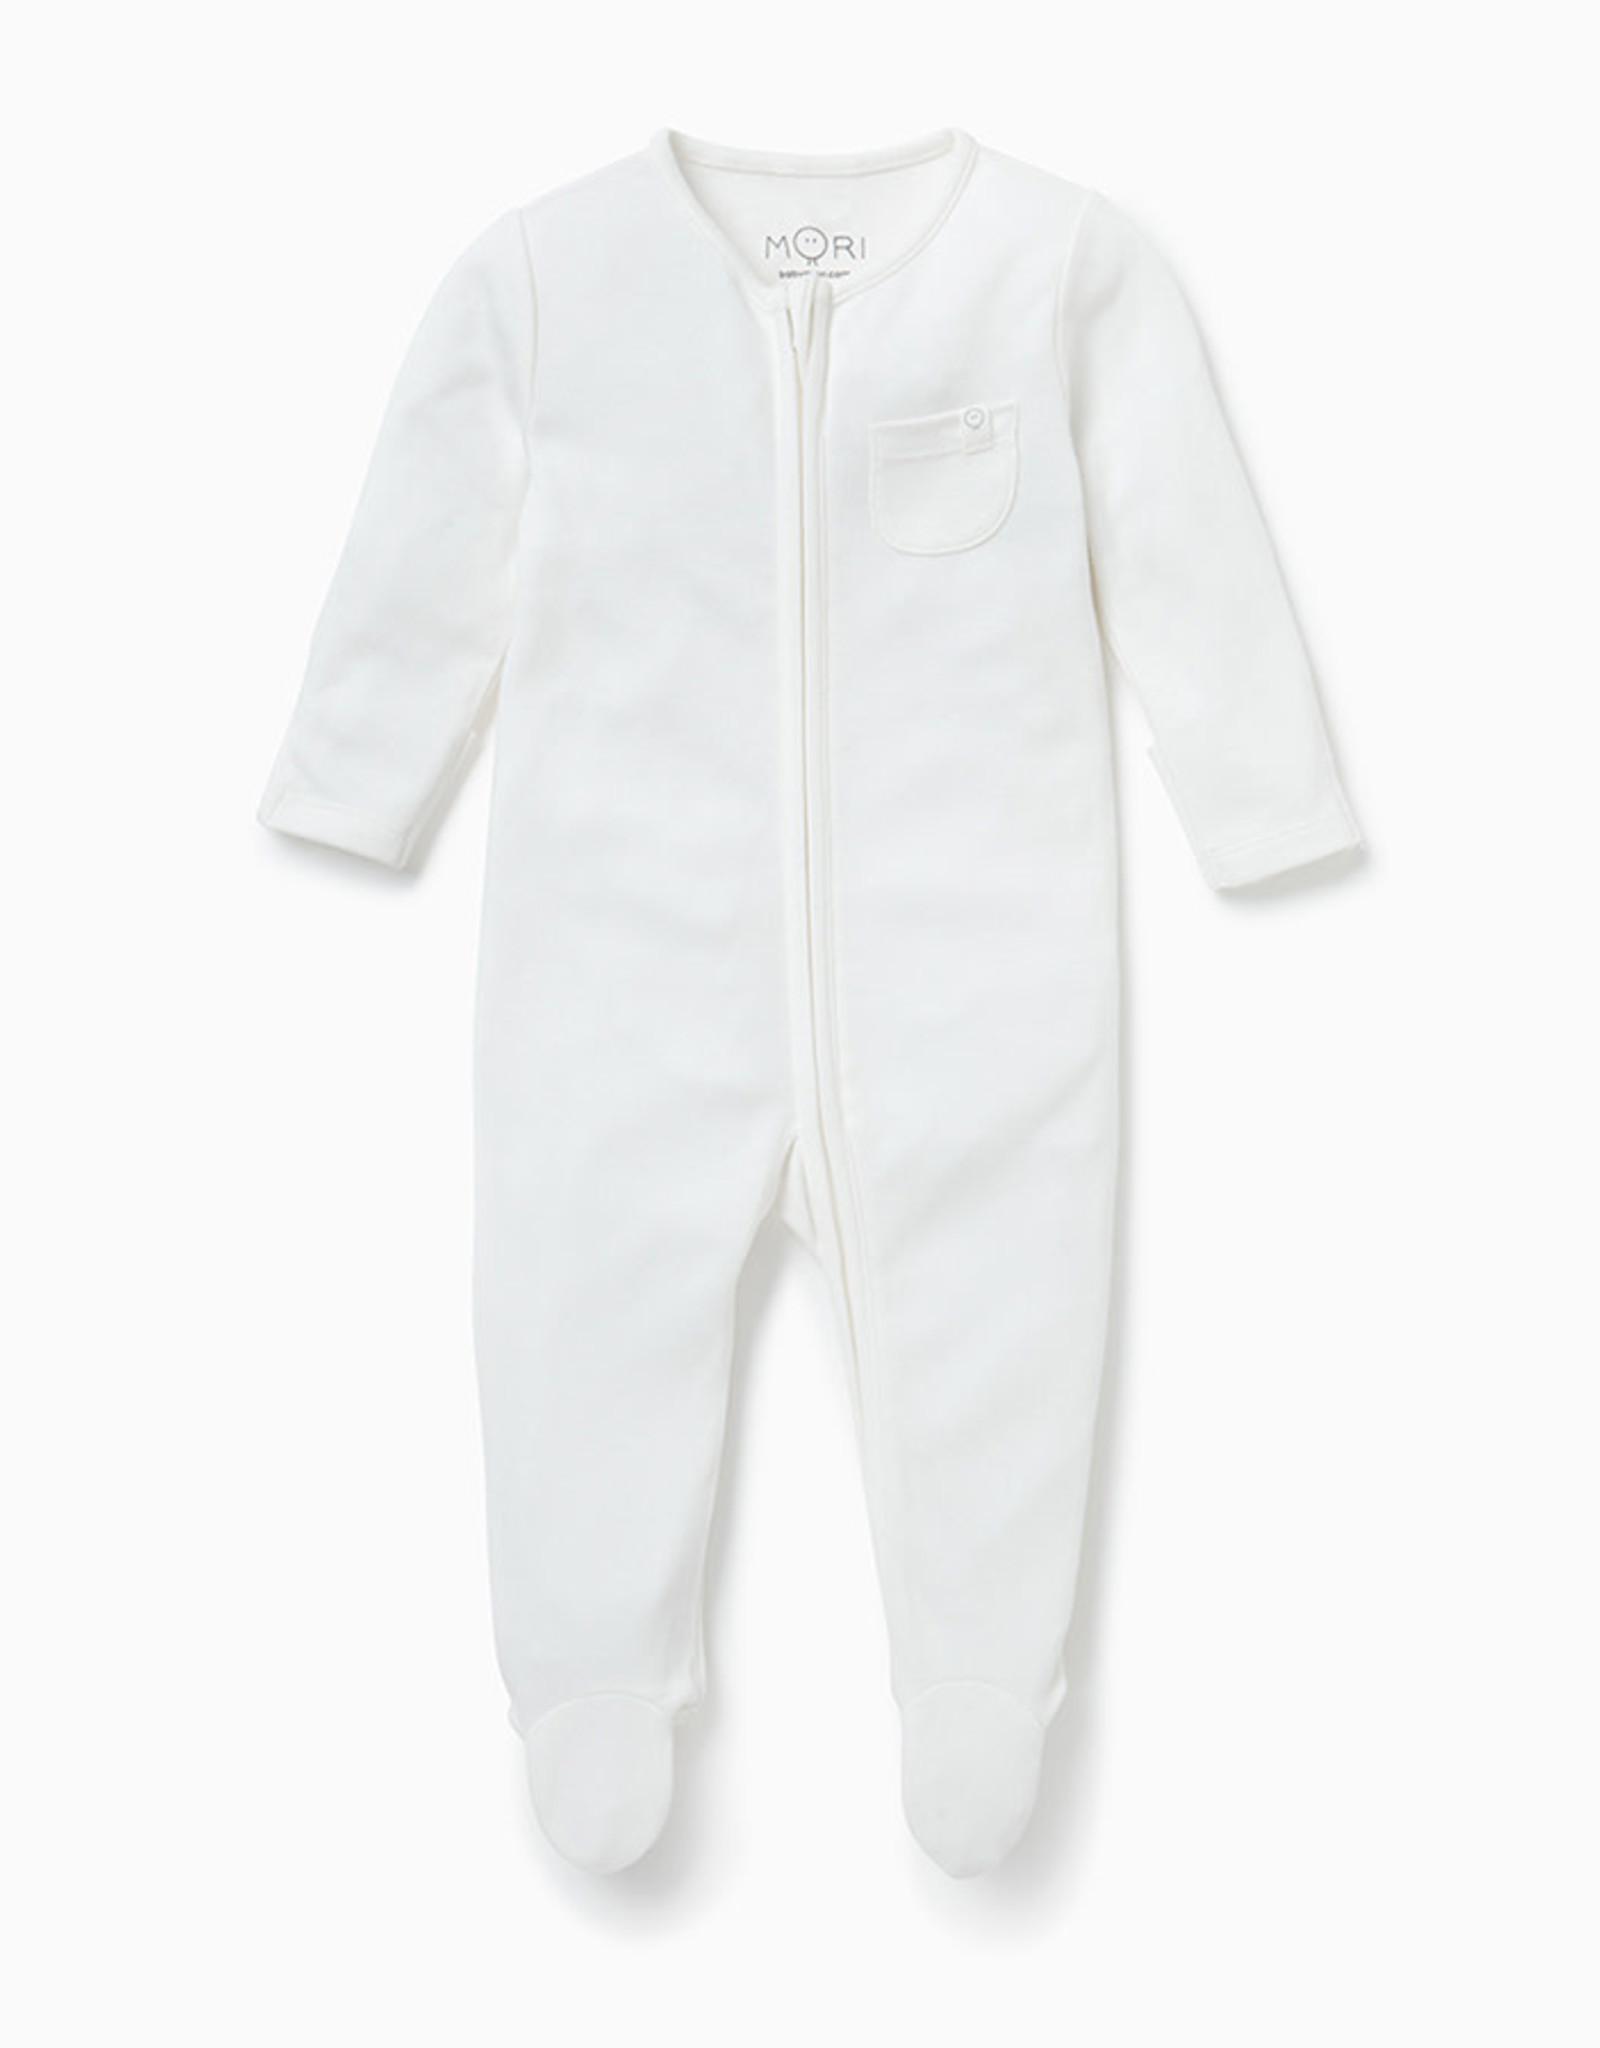 Baby Mori Baby Zip-Up Sleepsuit